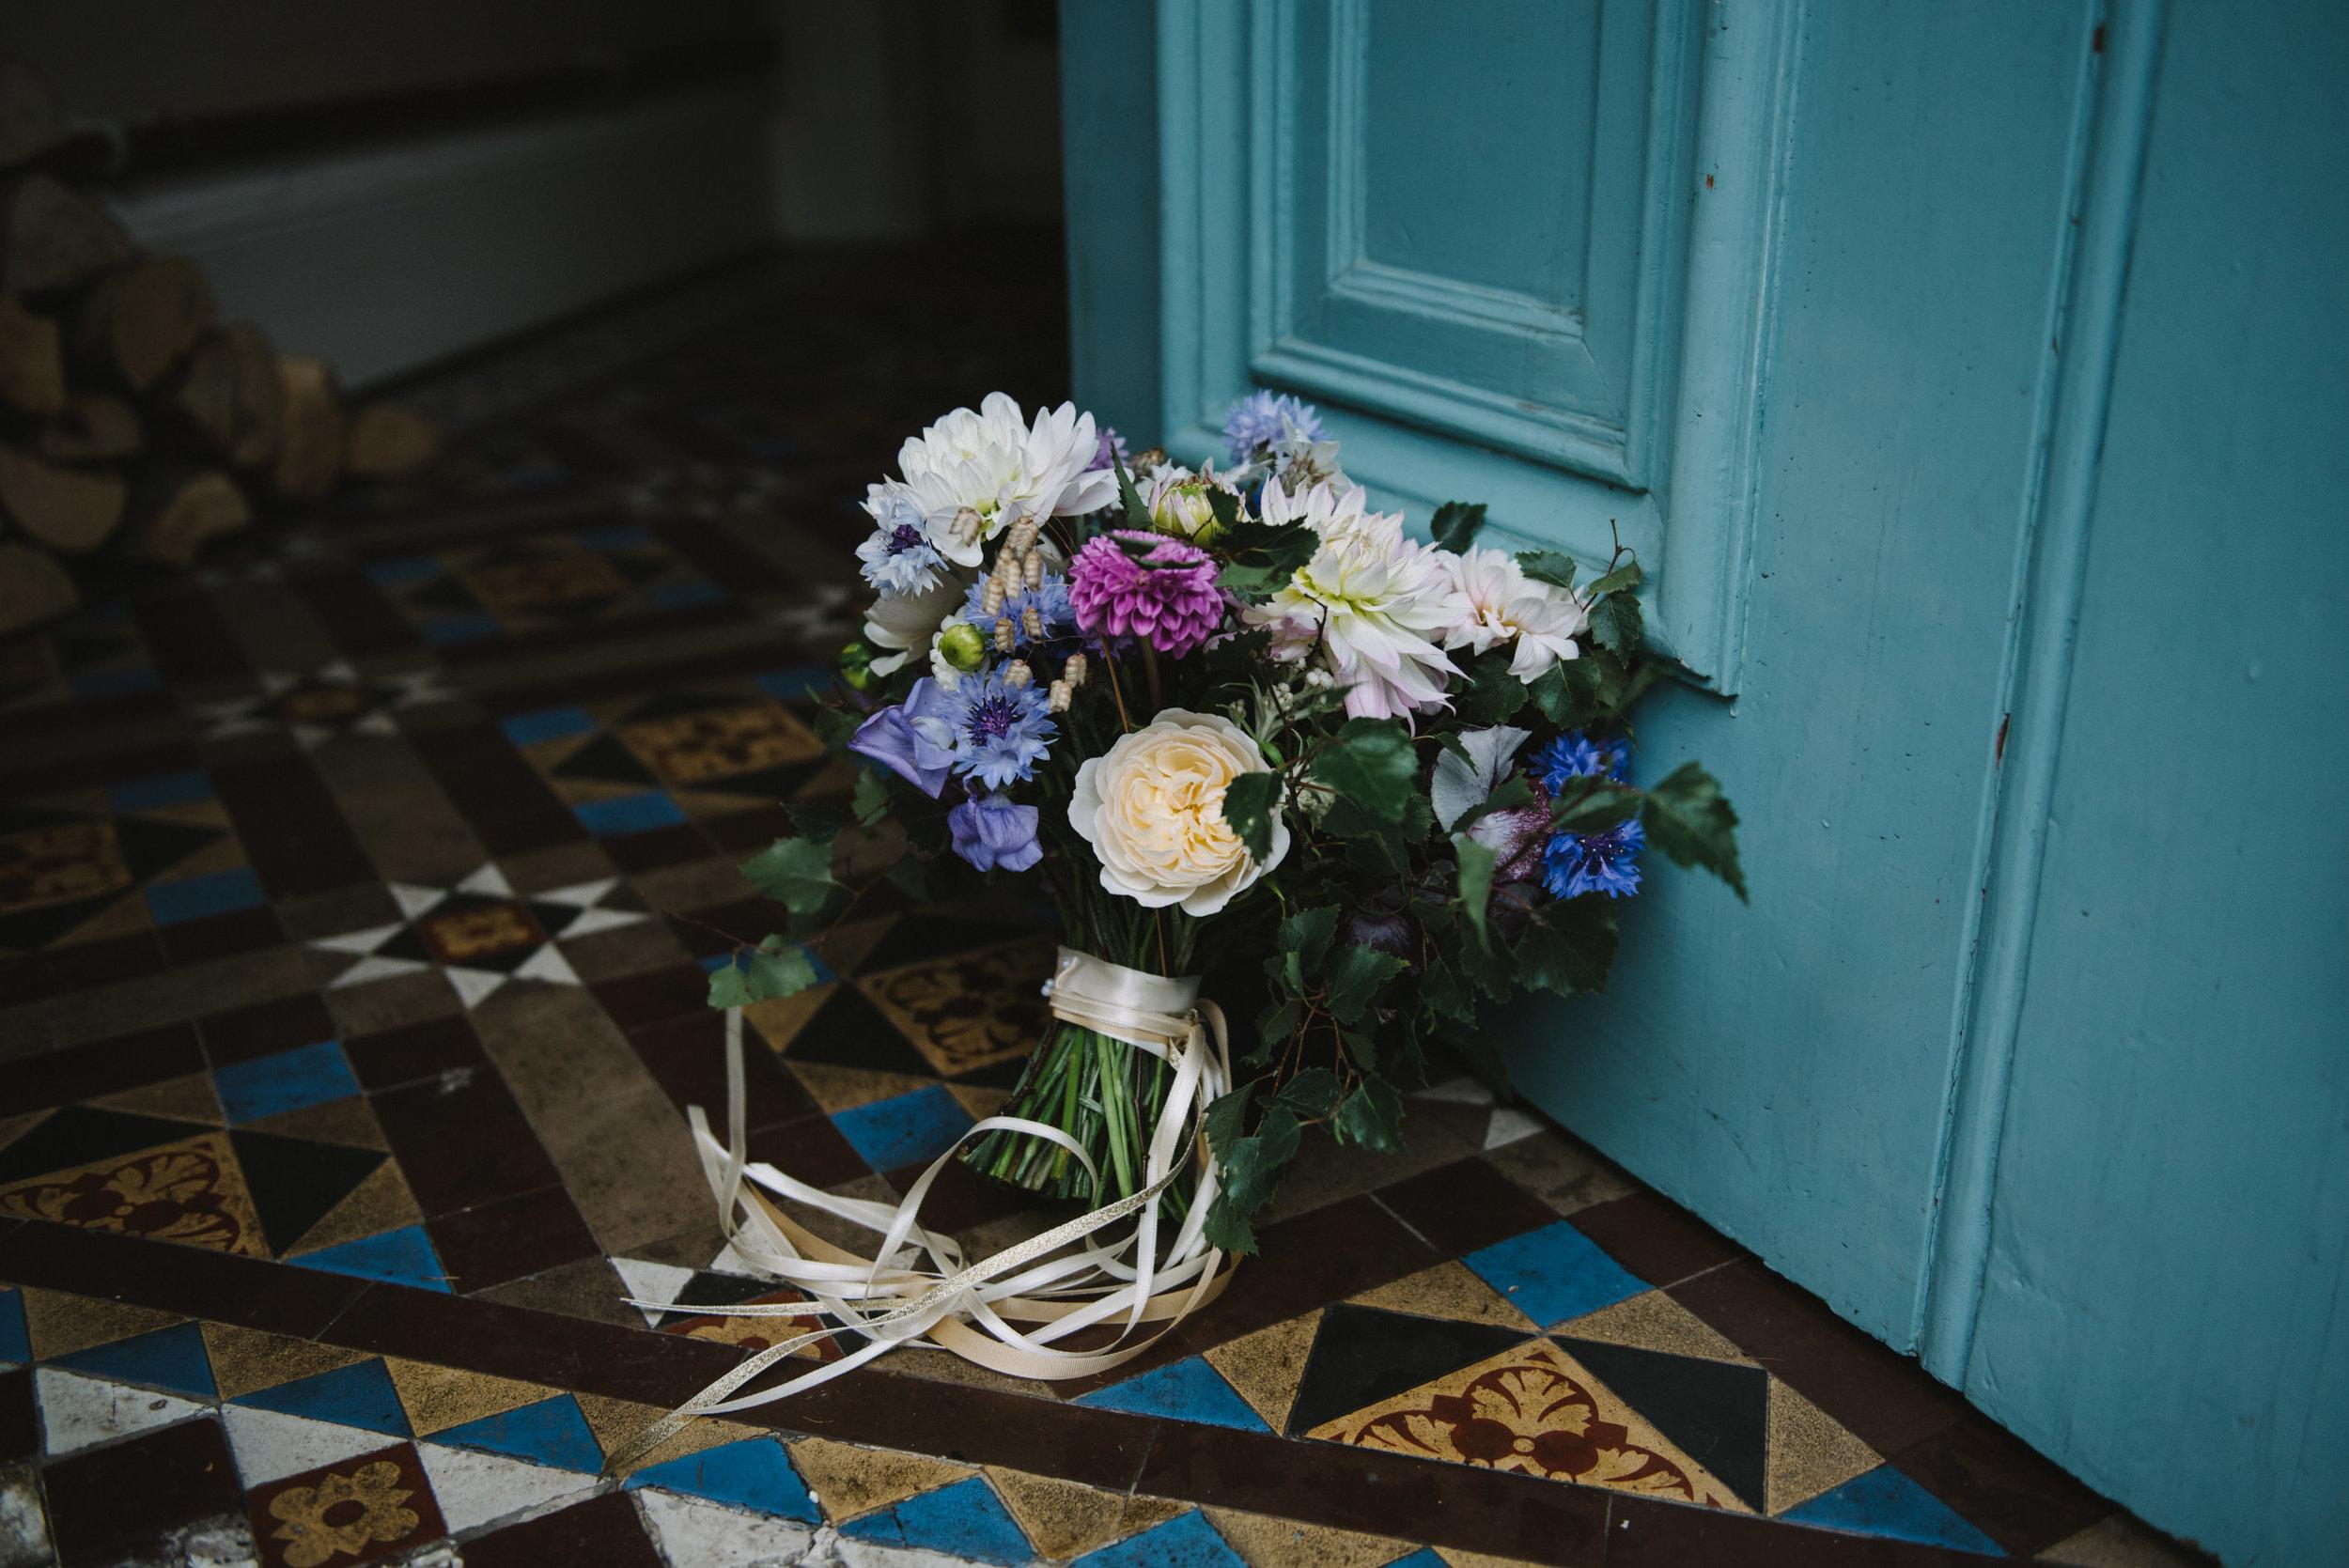 0083-LISA-DEVINE-PHOTOGRAPHY-ALTERNATIVE-WEDDING-PHOTOGRAPHY-SCOTLAND-DESTINATION-WEDDINGS-GLASGOW-WEDDINGS-COOL-WEDDINGS-STYLISH-WEDDINGS.JPG